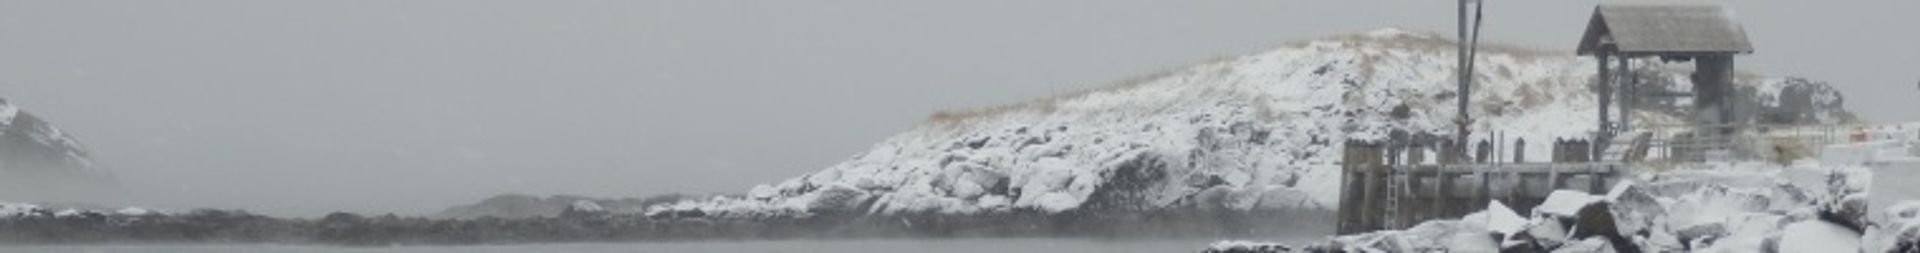 Monhegan Wharf in Winter